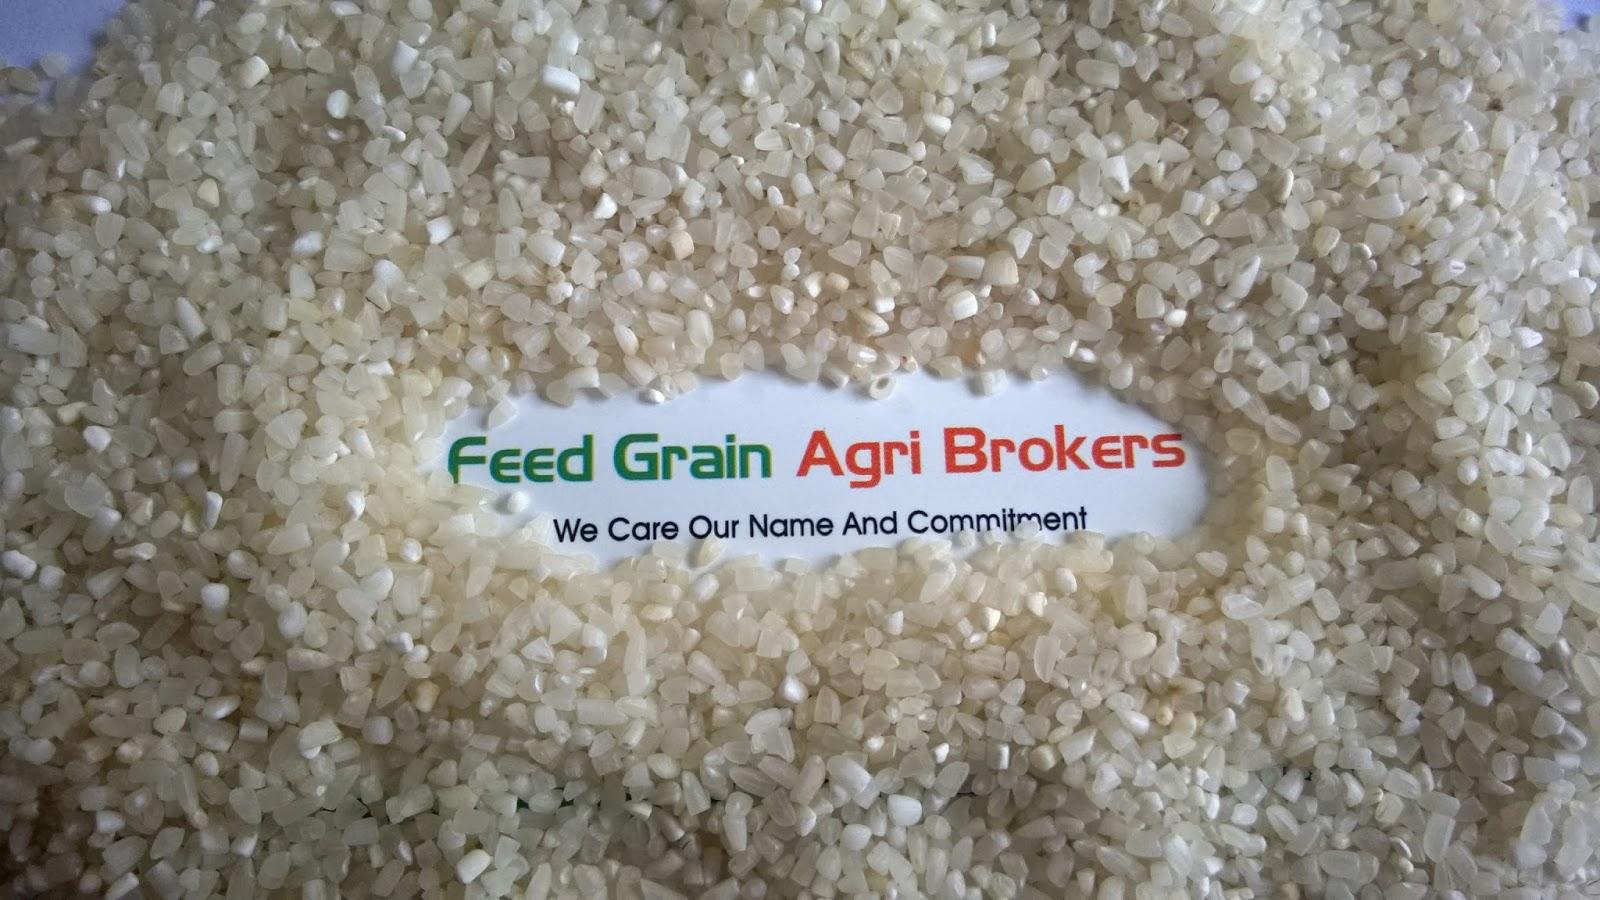 Pankaj Katba Feed Grain Agri Brokers Community AgroChart